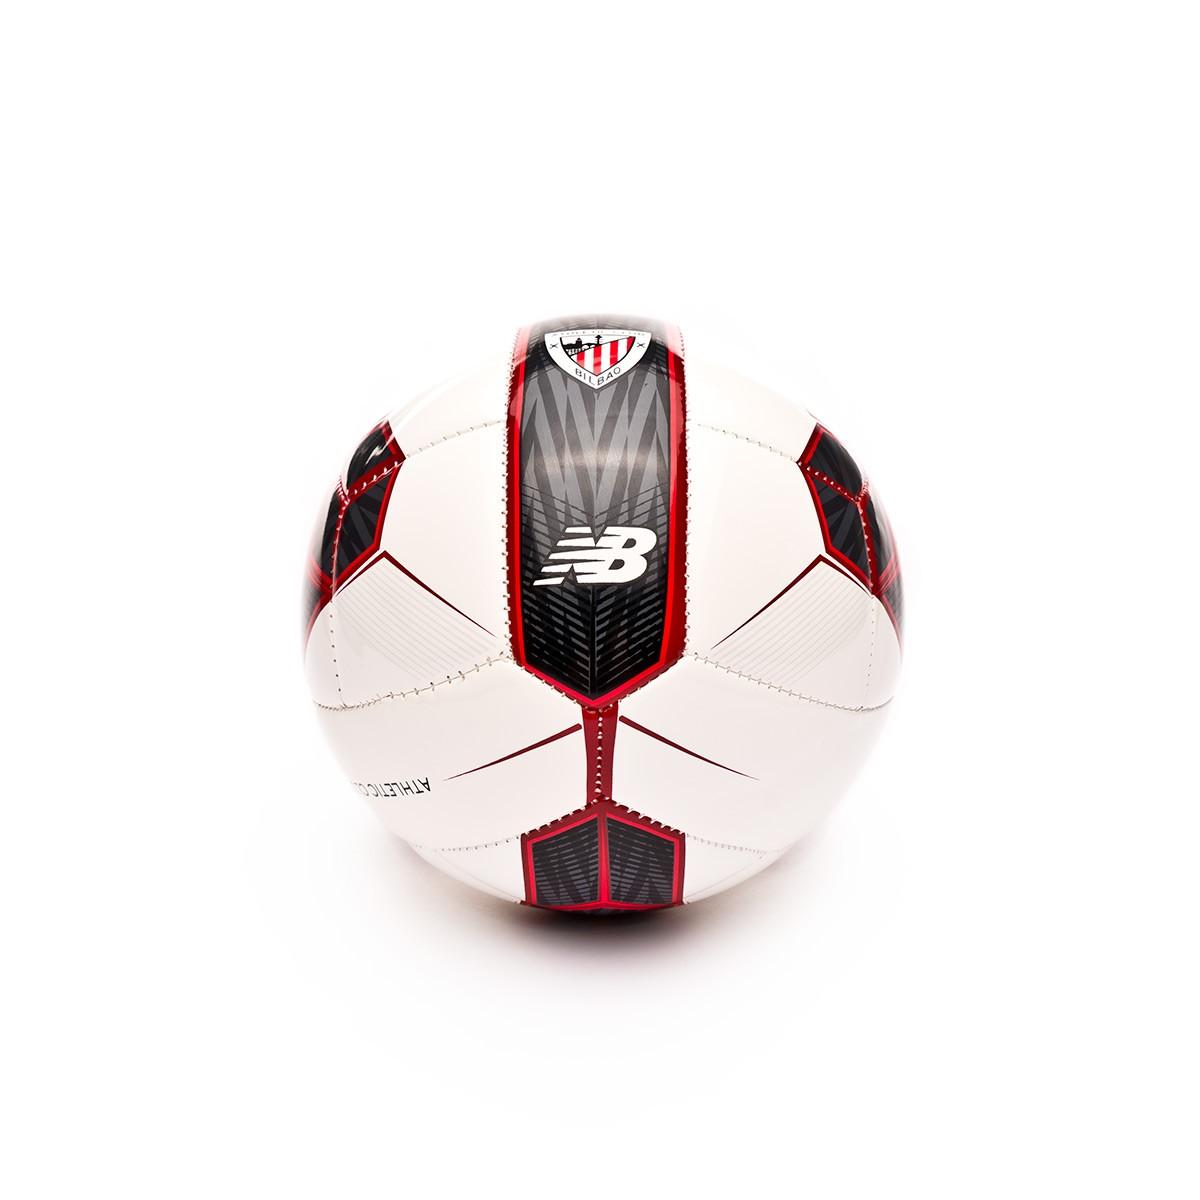 Balón Mini AC Bilbao Dispatch 2018 2019 White Red